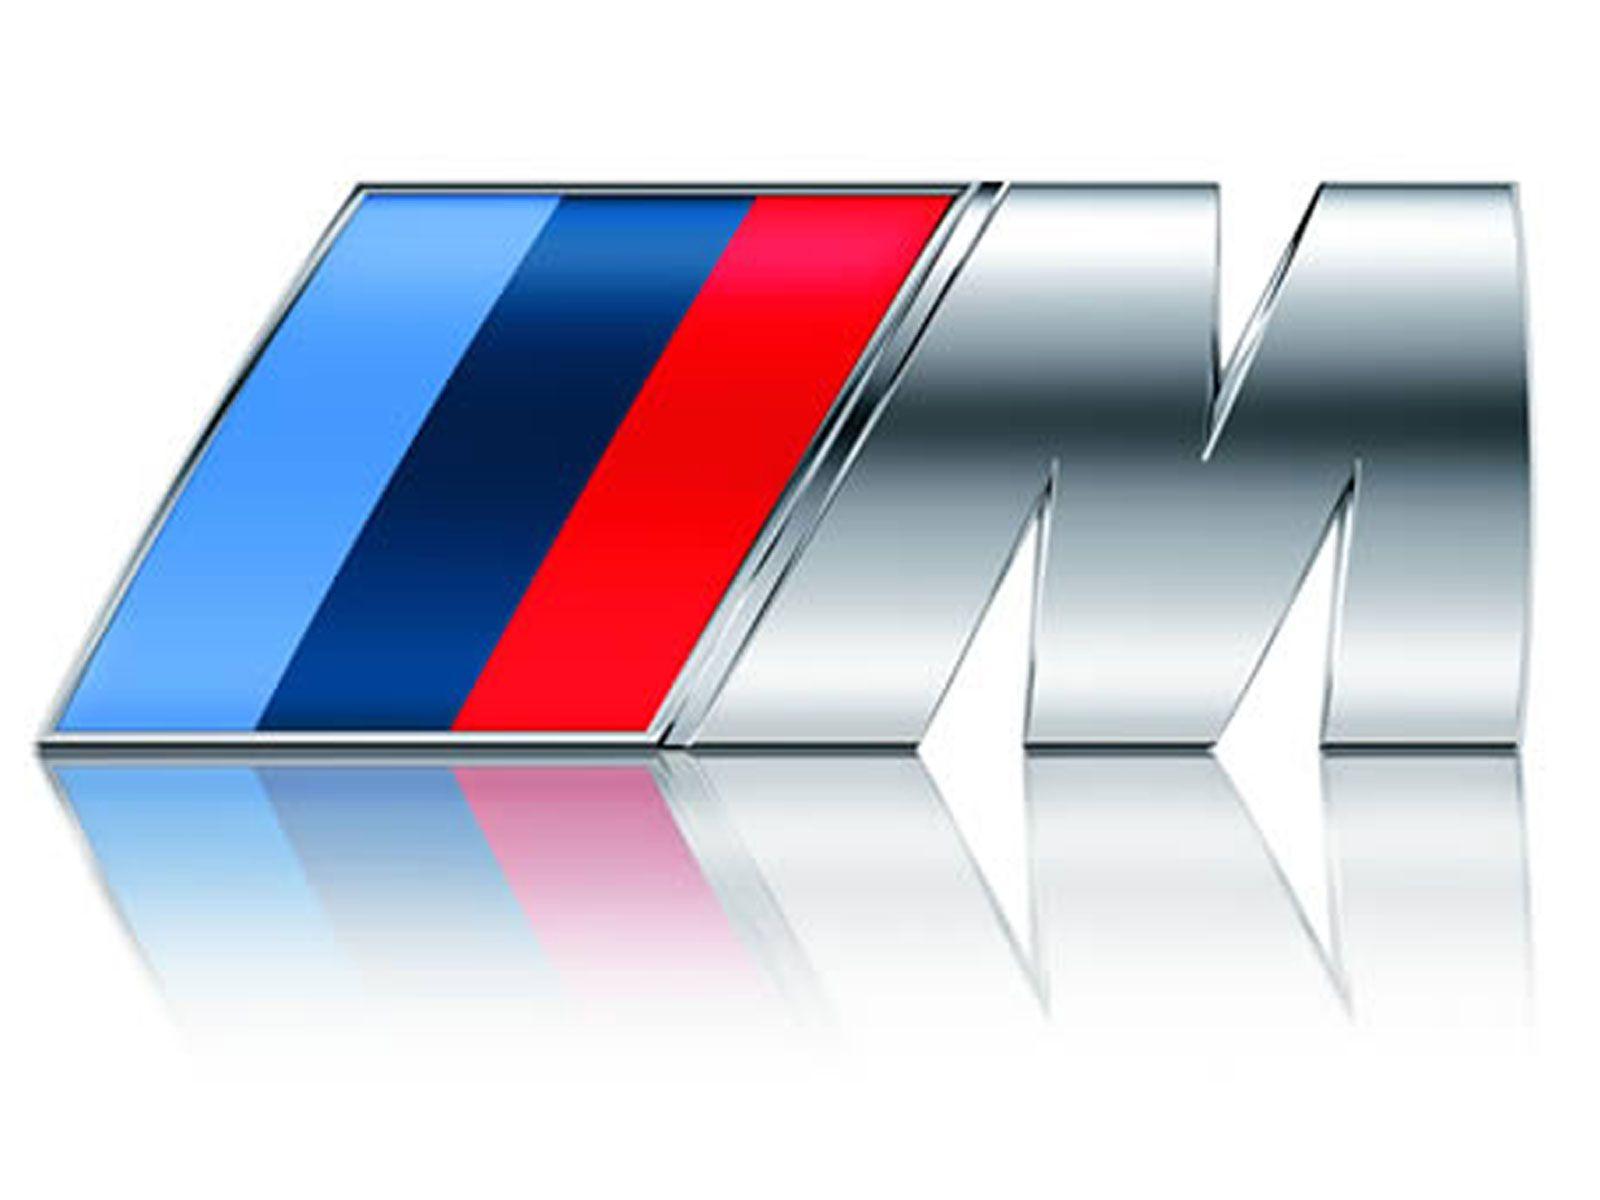 Zvonuri BMW M GmbH ar vrea sa construiasca un model propriu   BMWBLOG 1600x1200